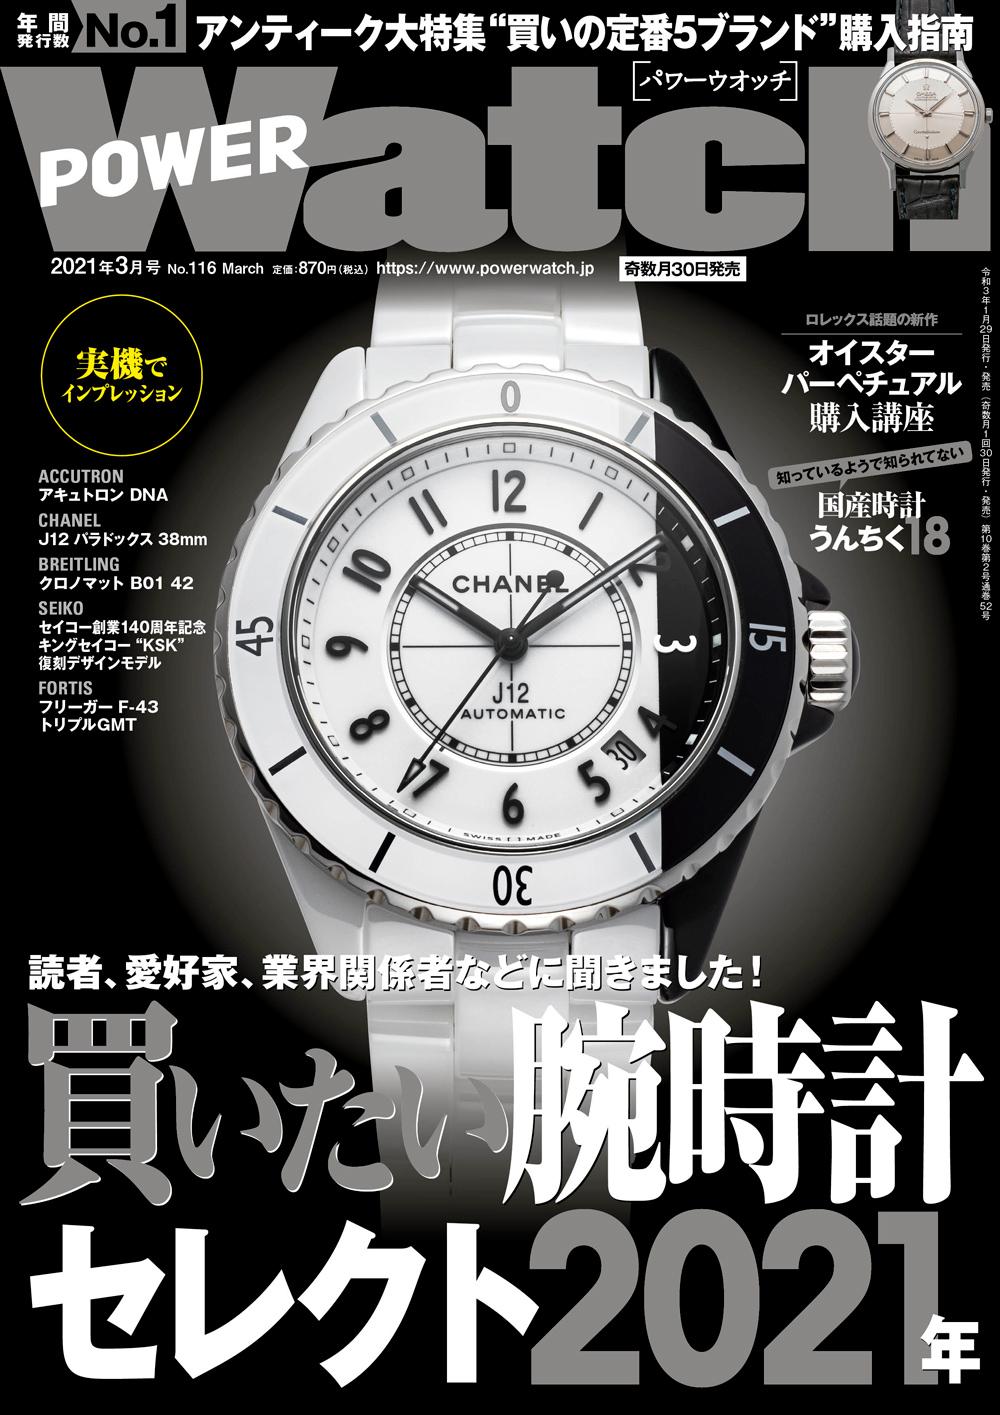 C's-Factory|書籍|PowerWATCH 3月号